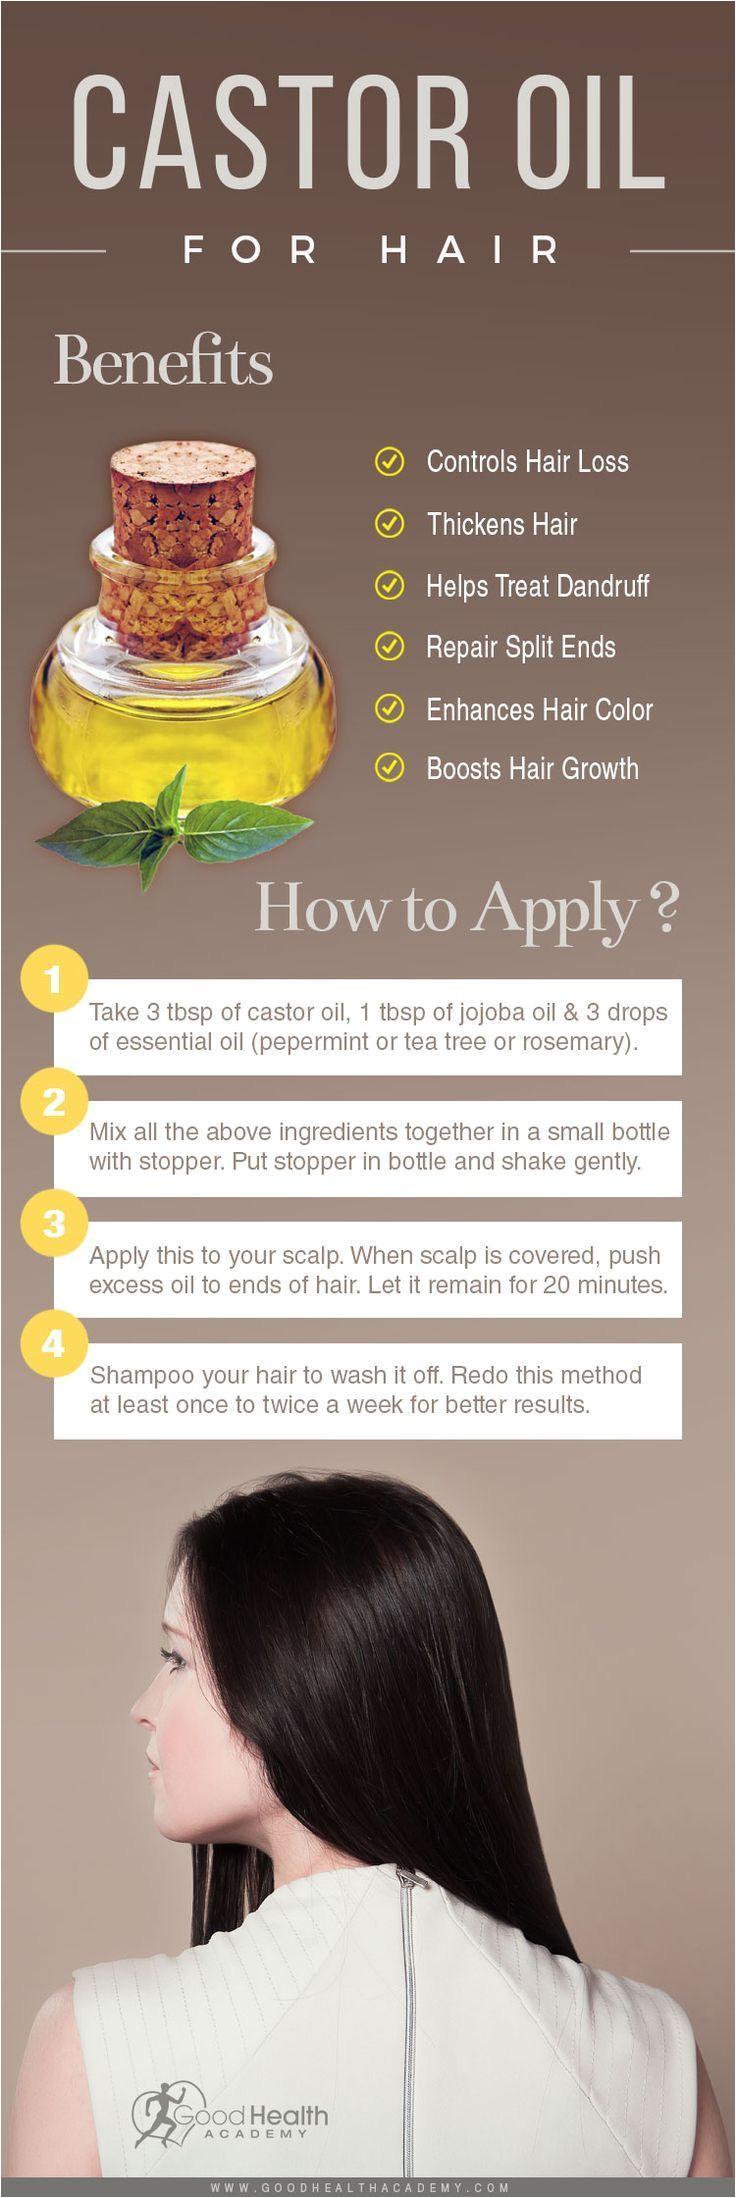 Rejuvalex Hair Growth Reviews 14 Best Oil for Hair Growth Images On Pinterest